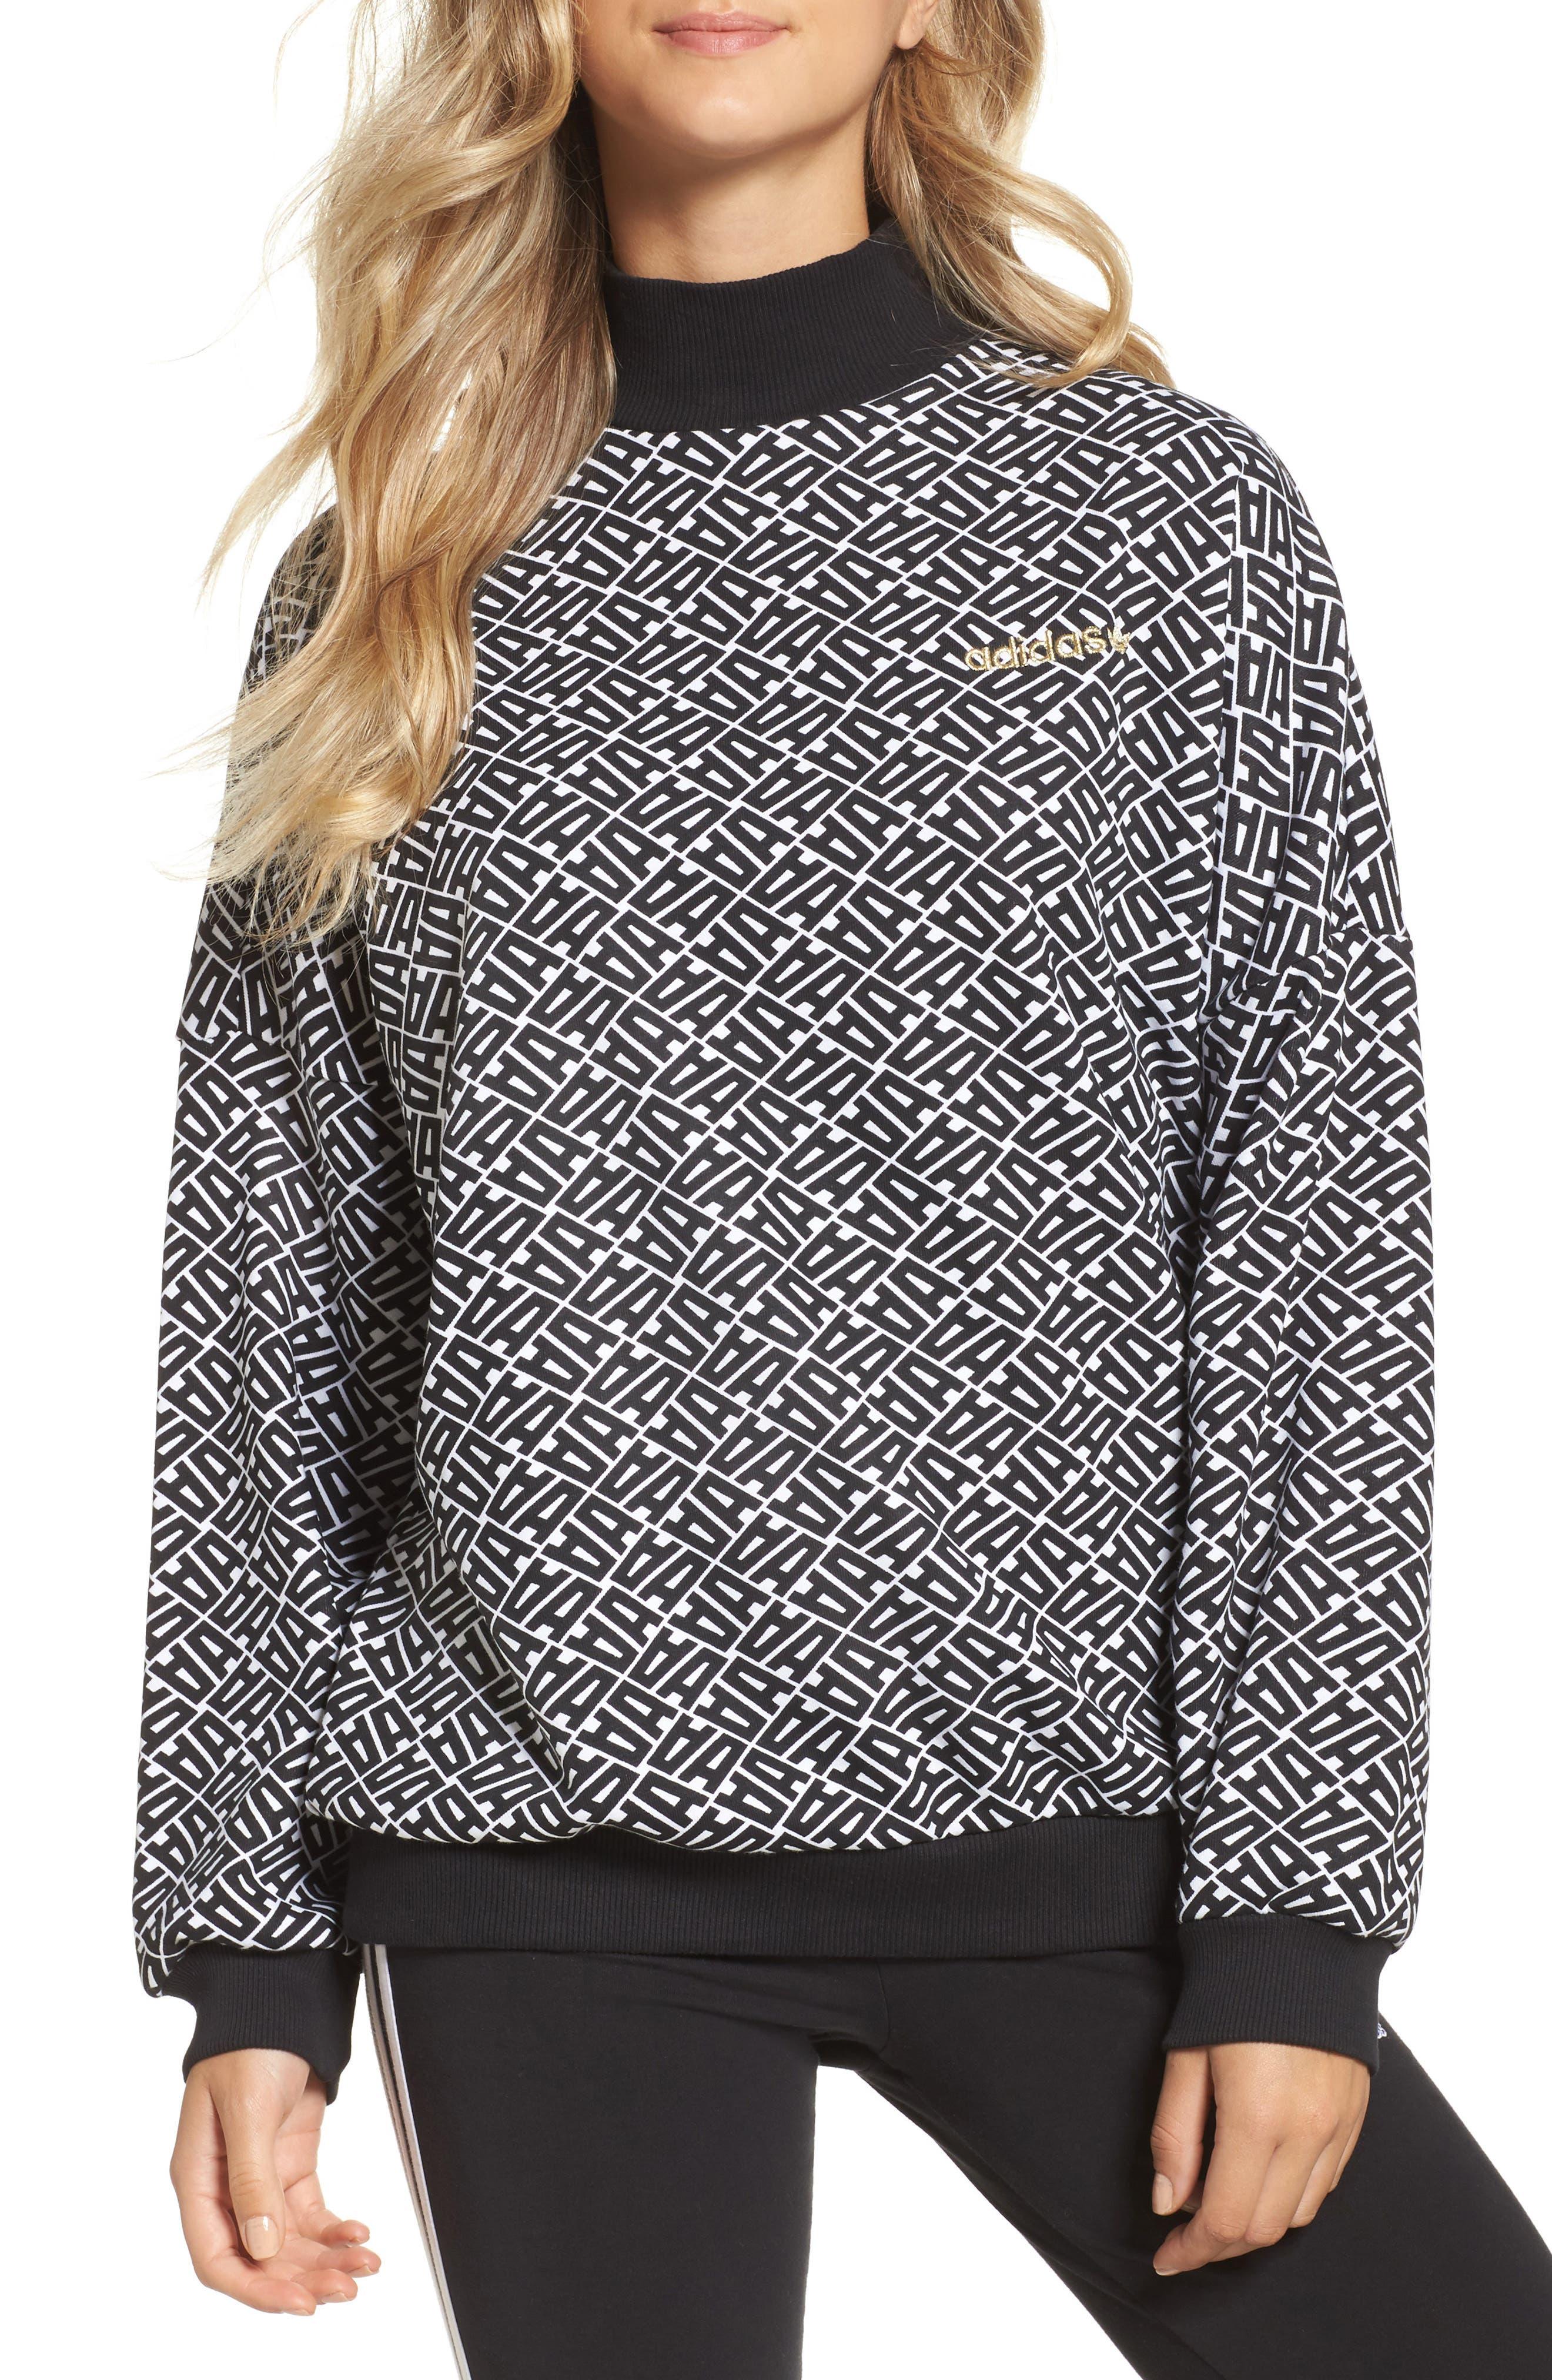 AOP Print Sweatshirt,                         Main,                         color, White/ Black